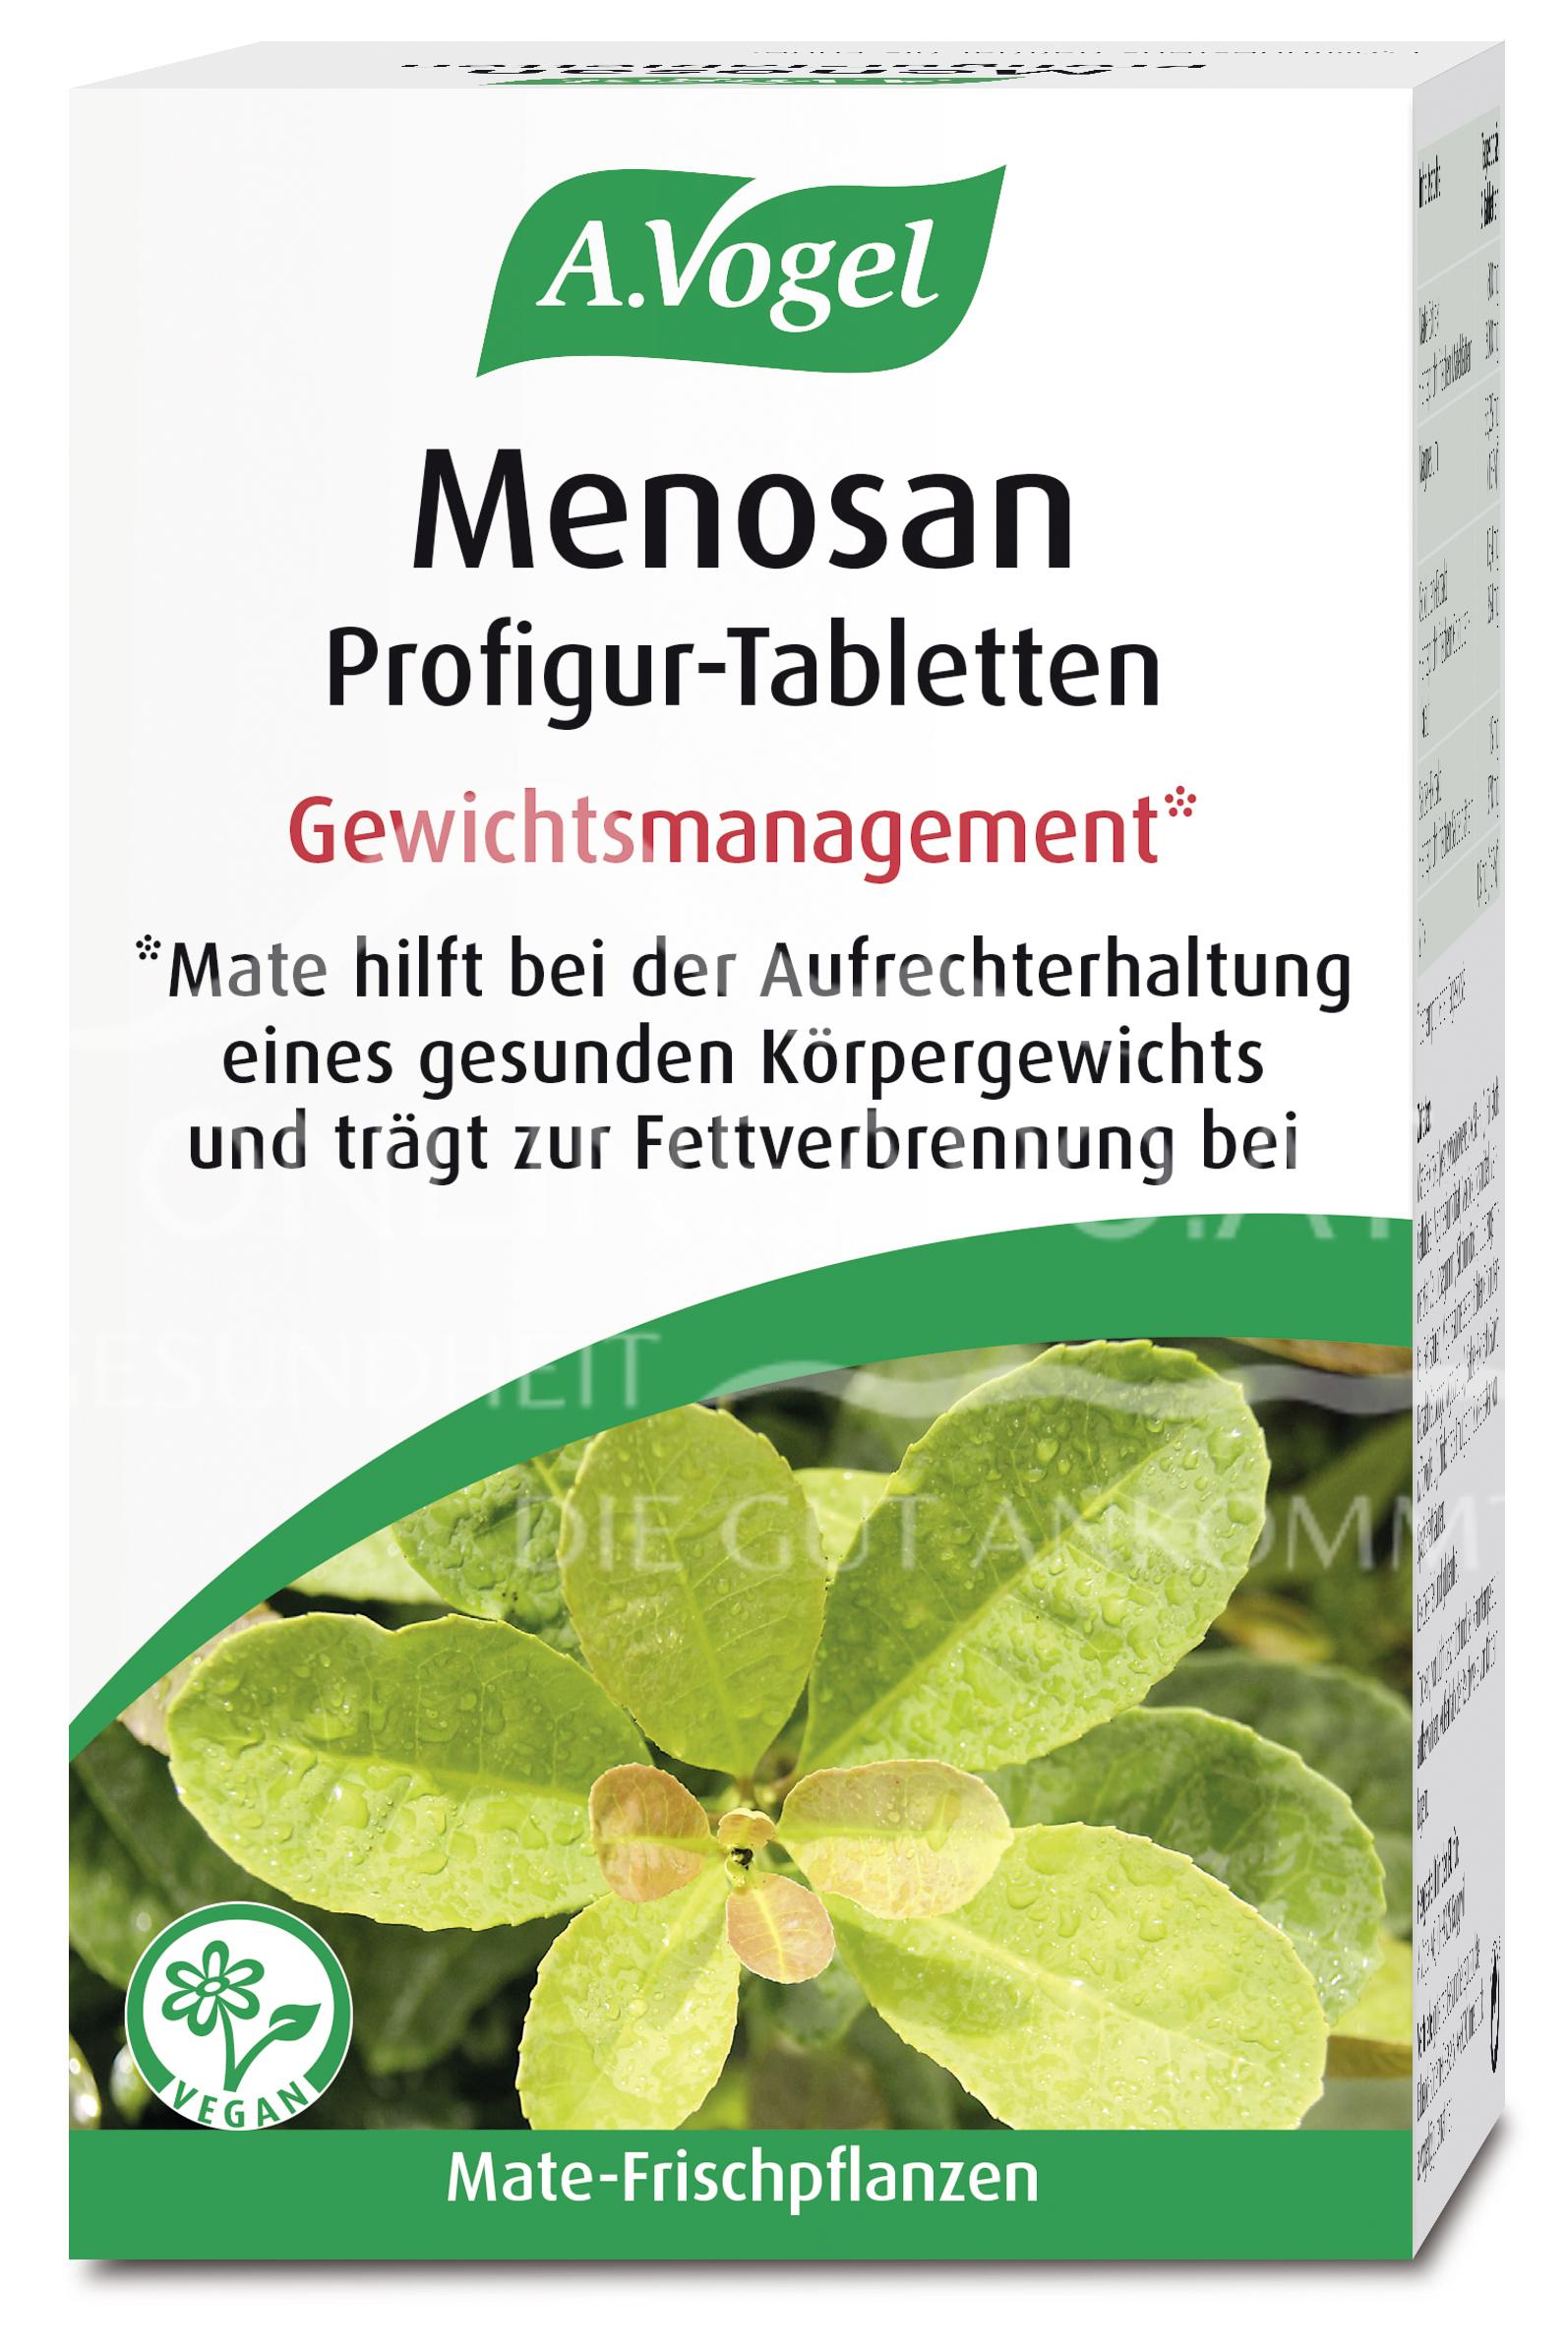 A.Vogel Menosan Profigur-Tabletten